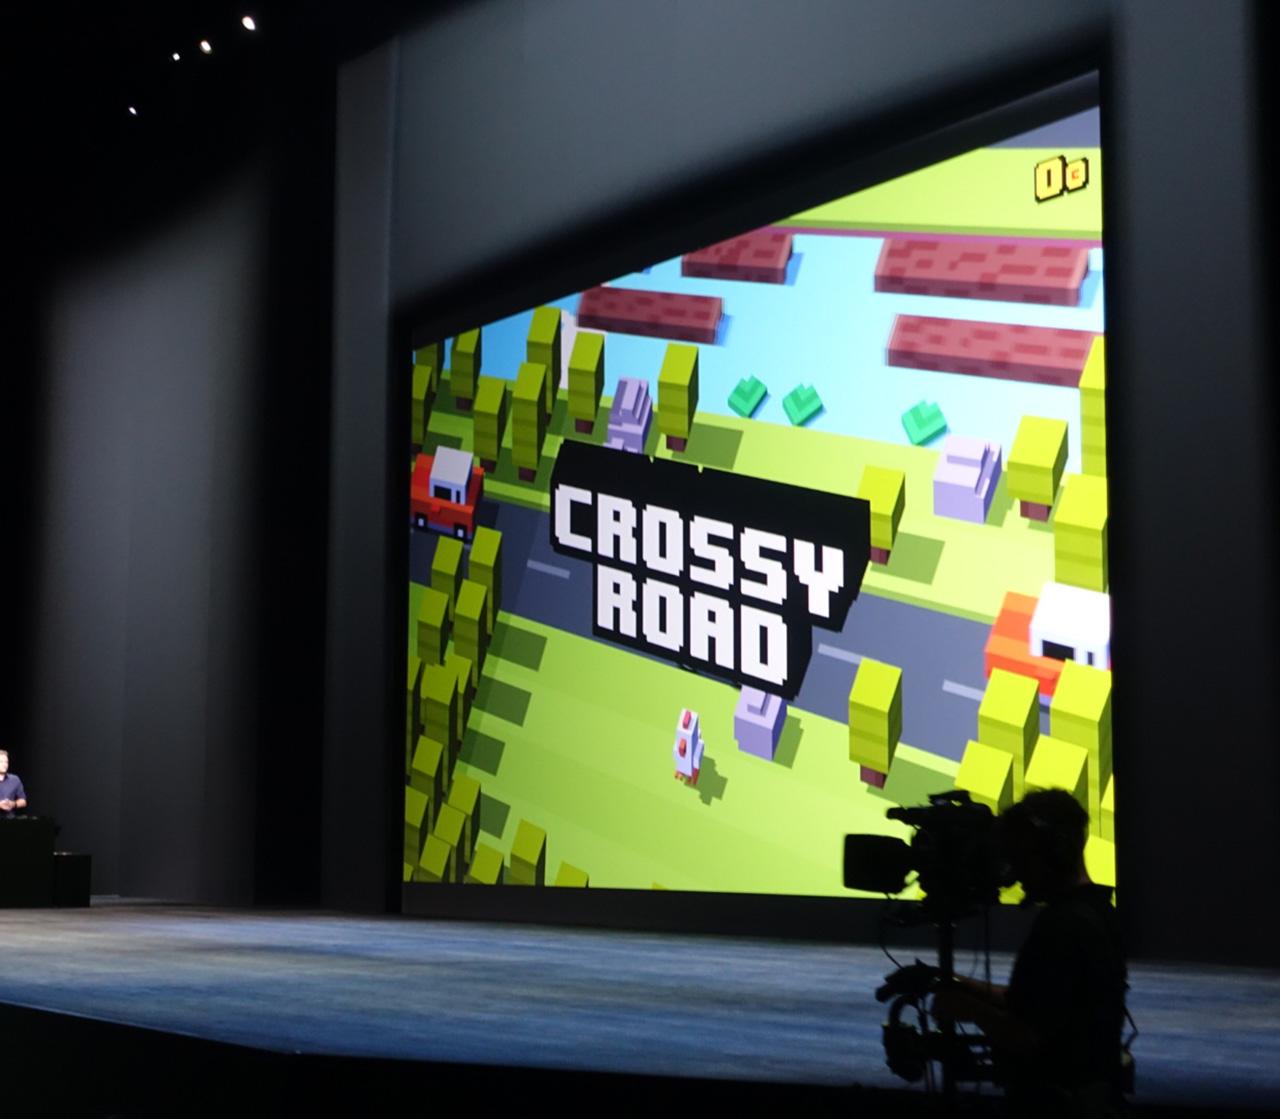 CrossyRoad